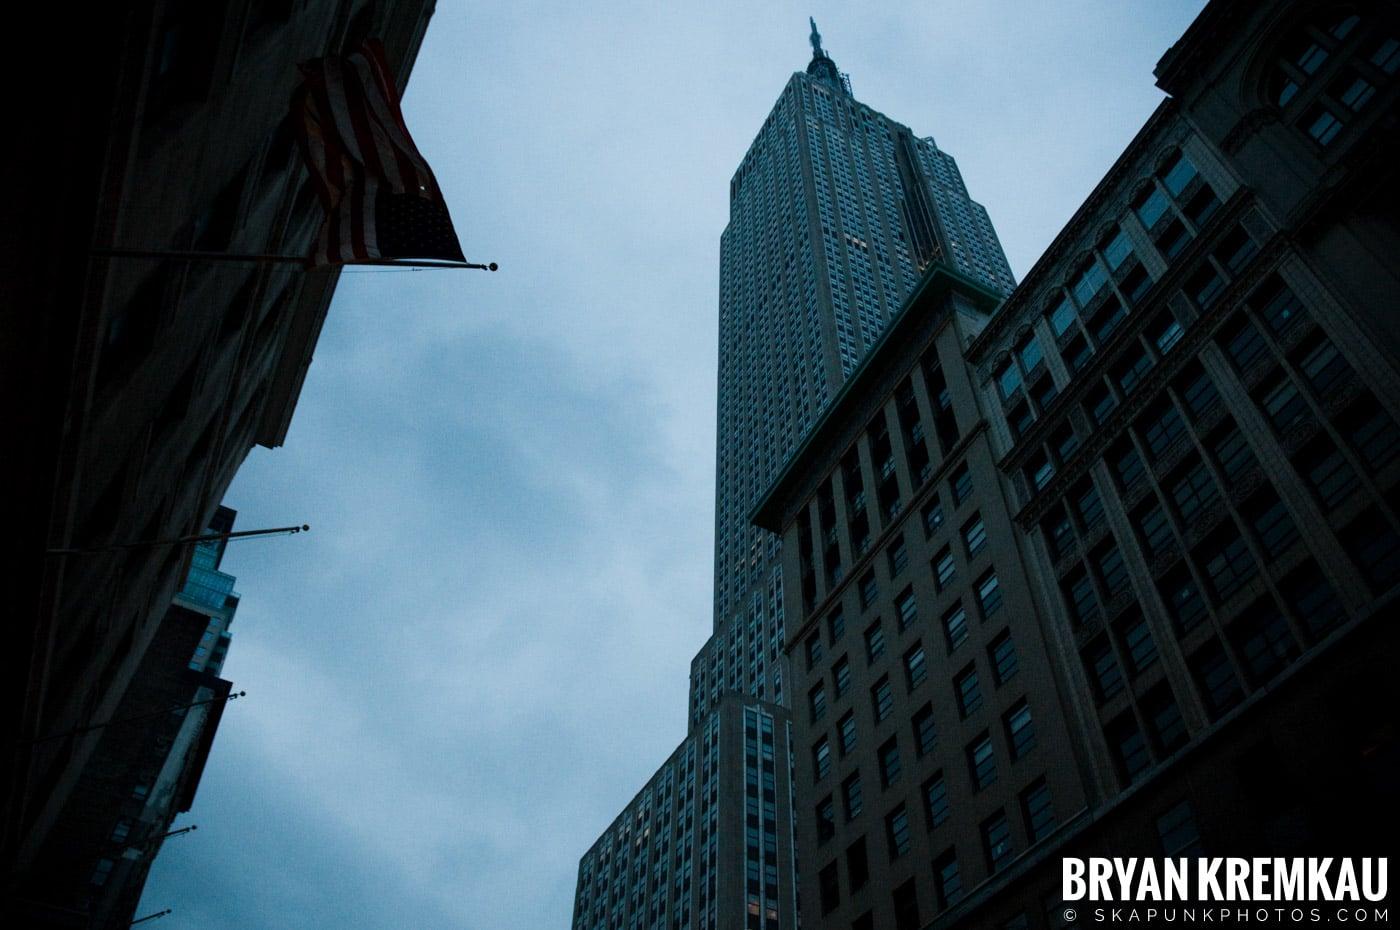 NYC Holiday Trip - 12.20.08 (23)